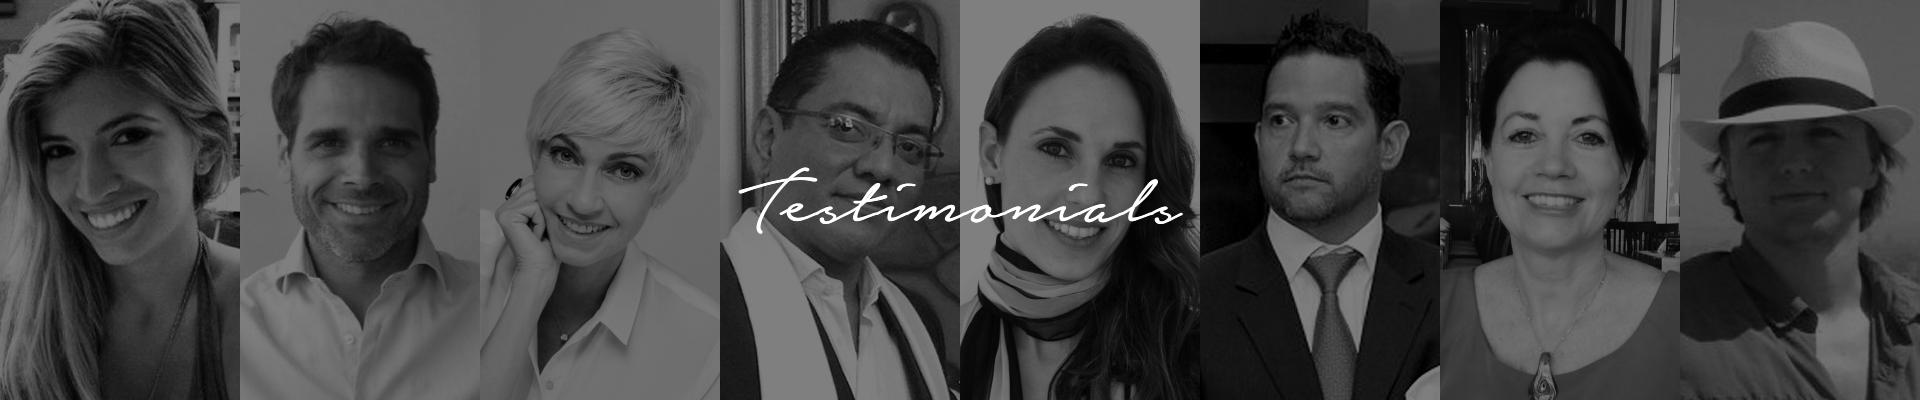 slide-testimonials